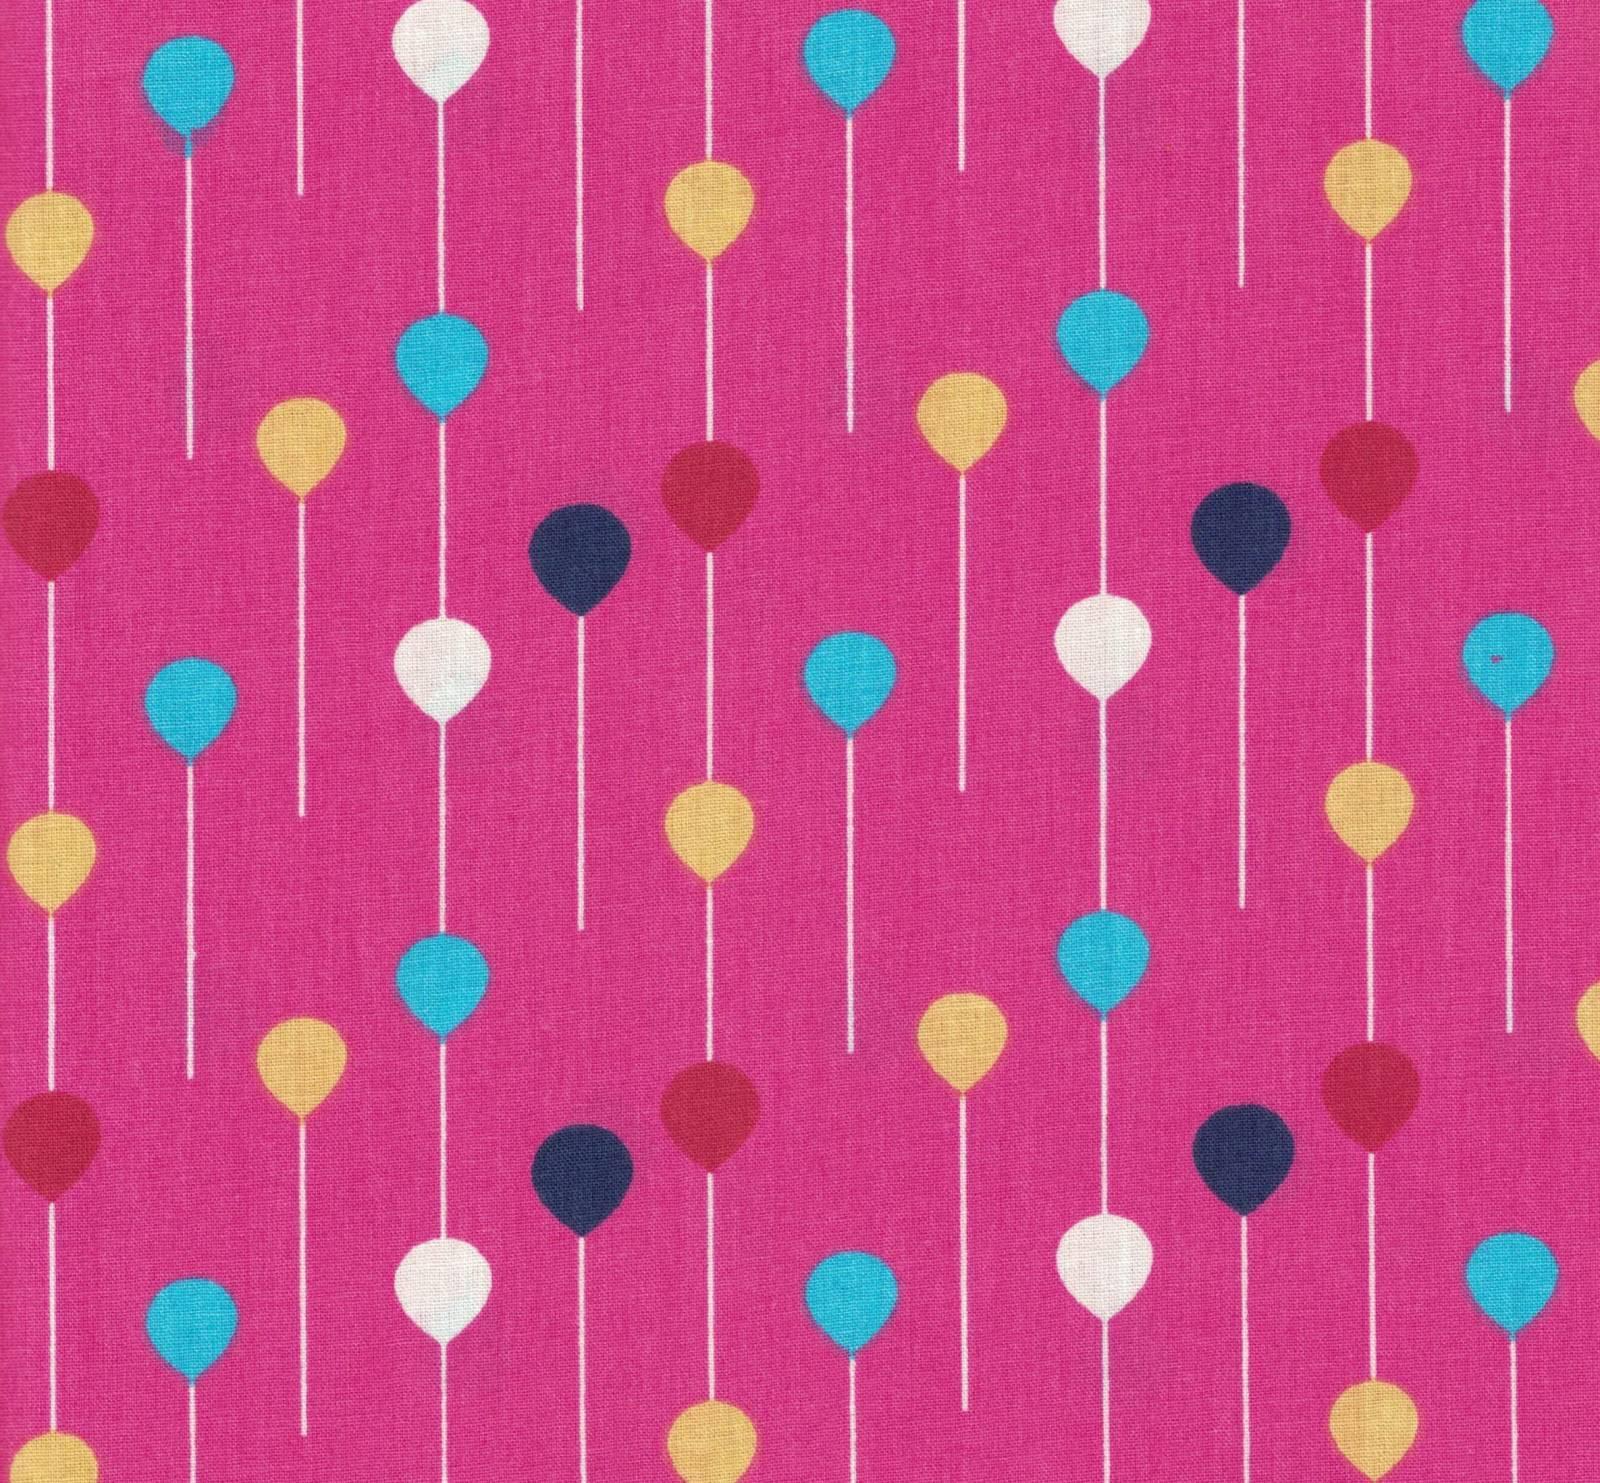 Bexigas Fundo Pink Ref. DC04 Decorart - Armarinhos Nodari